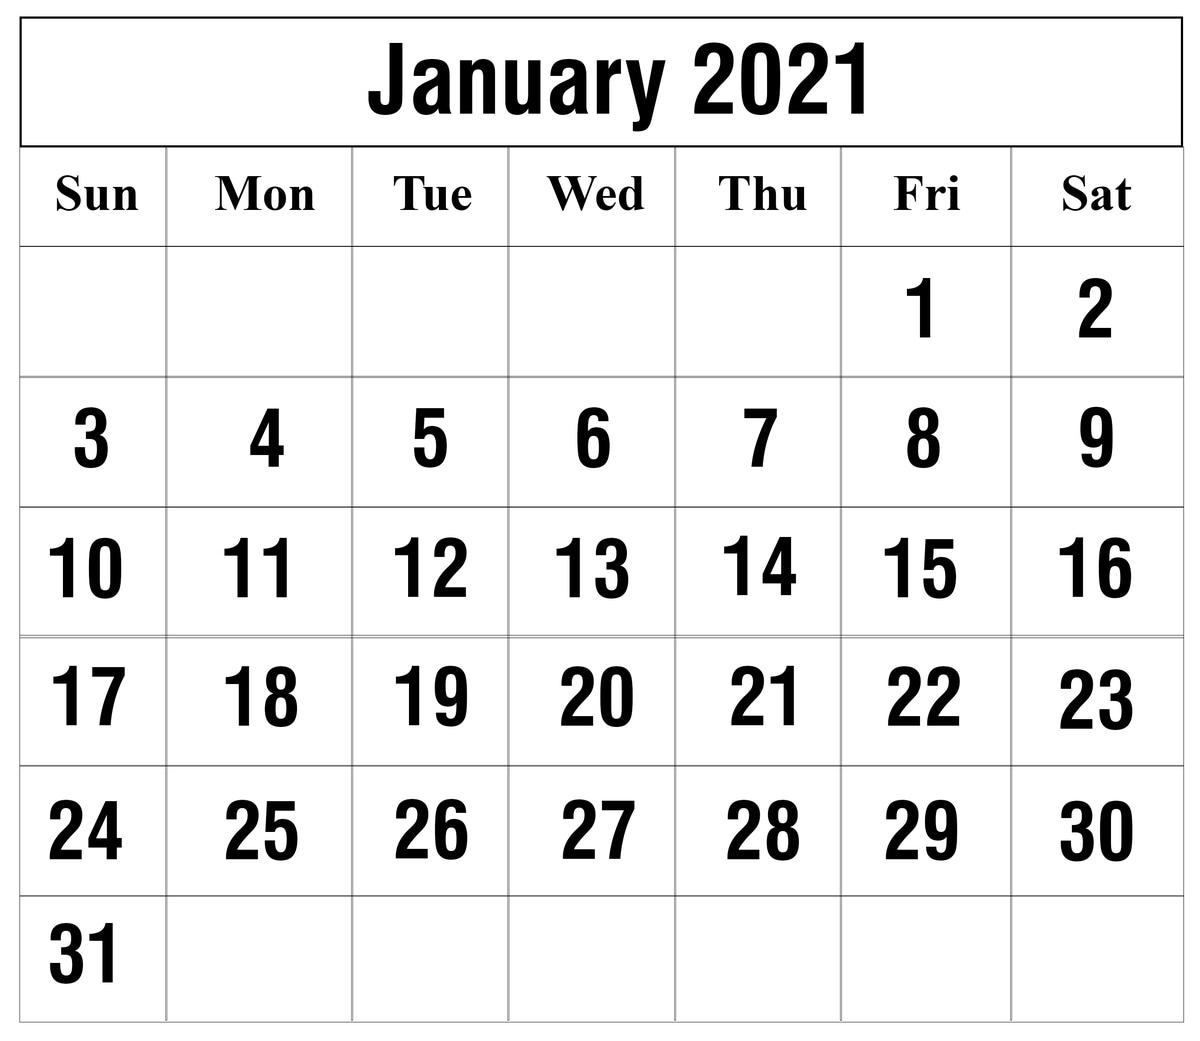 Julian Calendar 2021 Printable